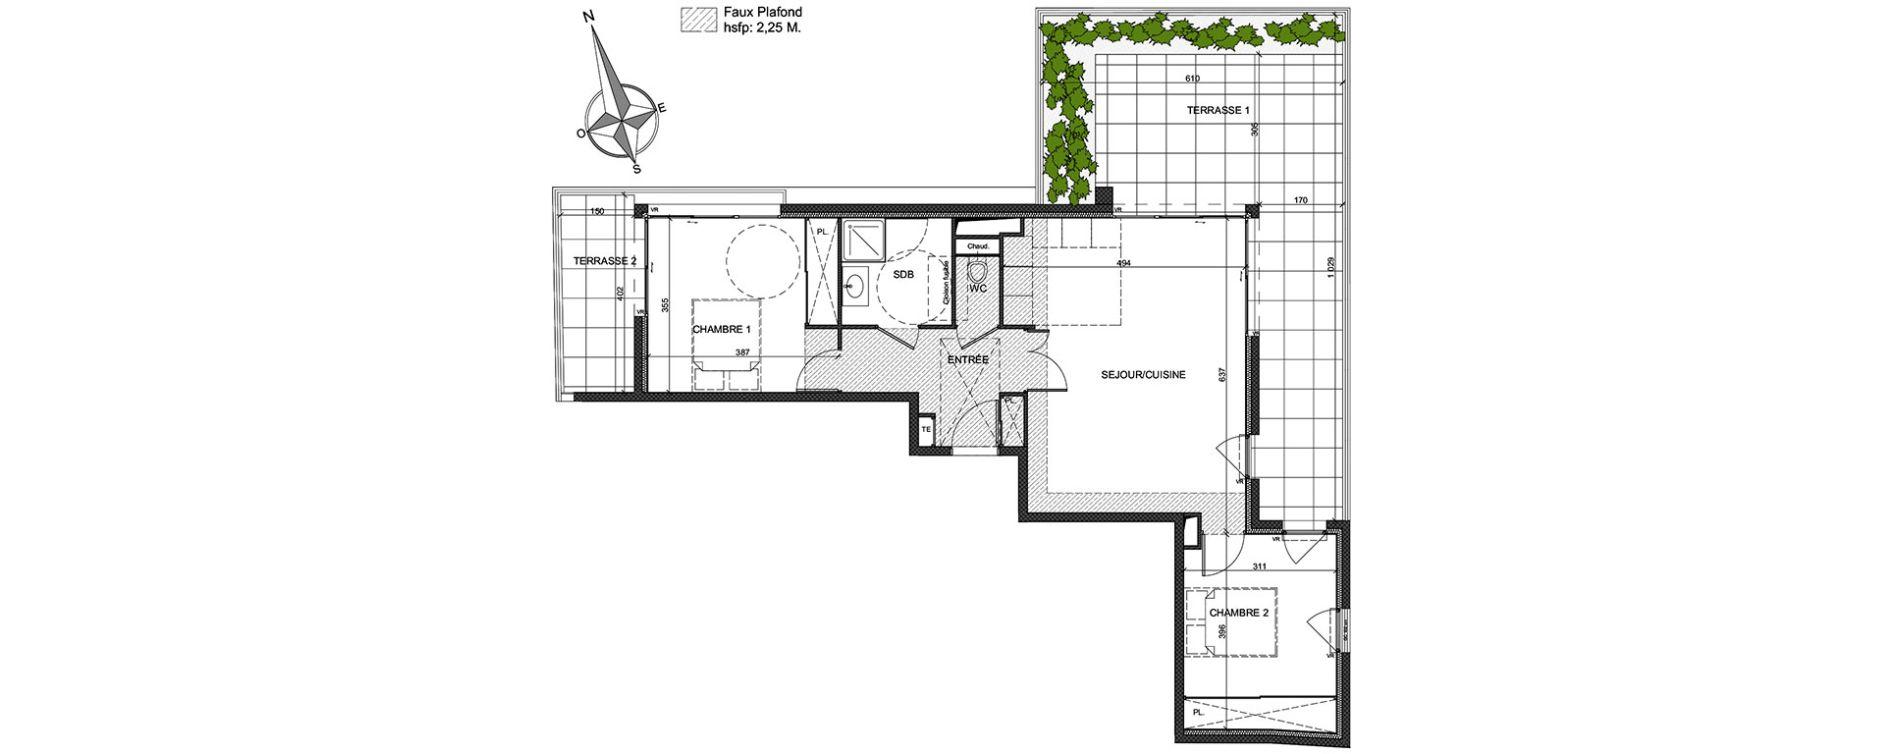 Appartement T3 de 66,91 m2 à Antibes Antibes coeur de ville